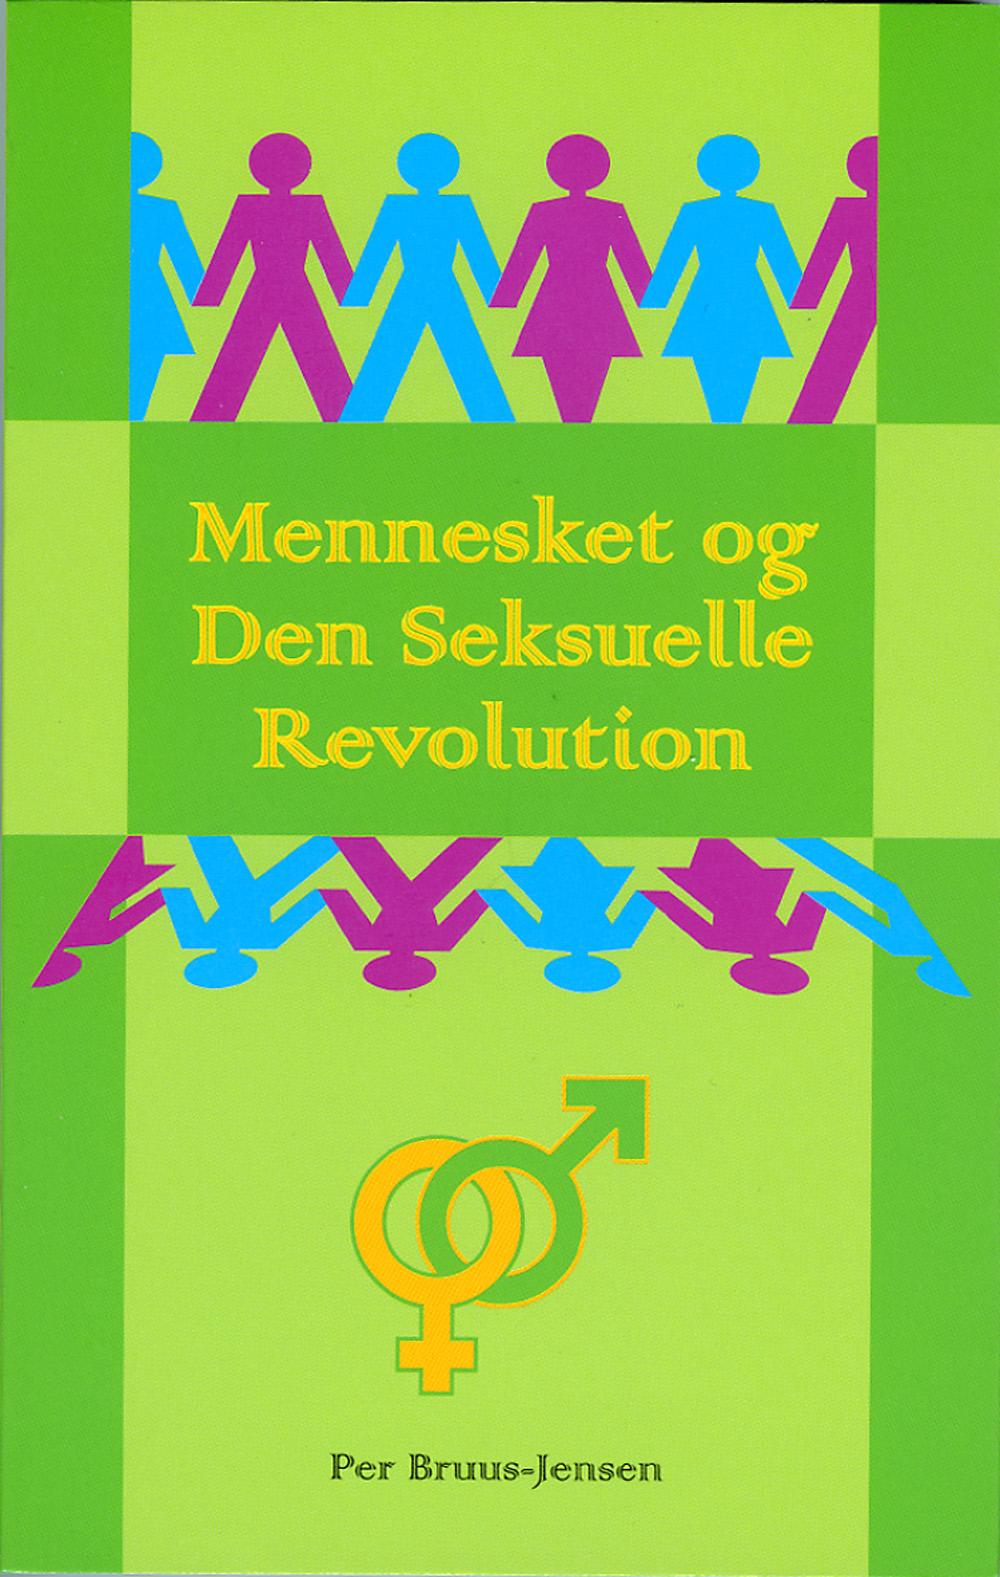 Mennesket og Den Seksuelle Revolution : om næstekærlighedens organiske grundlag og udvikling av Per Bruus-Jensen